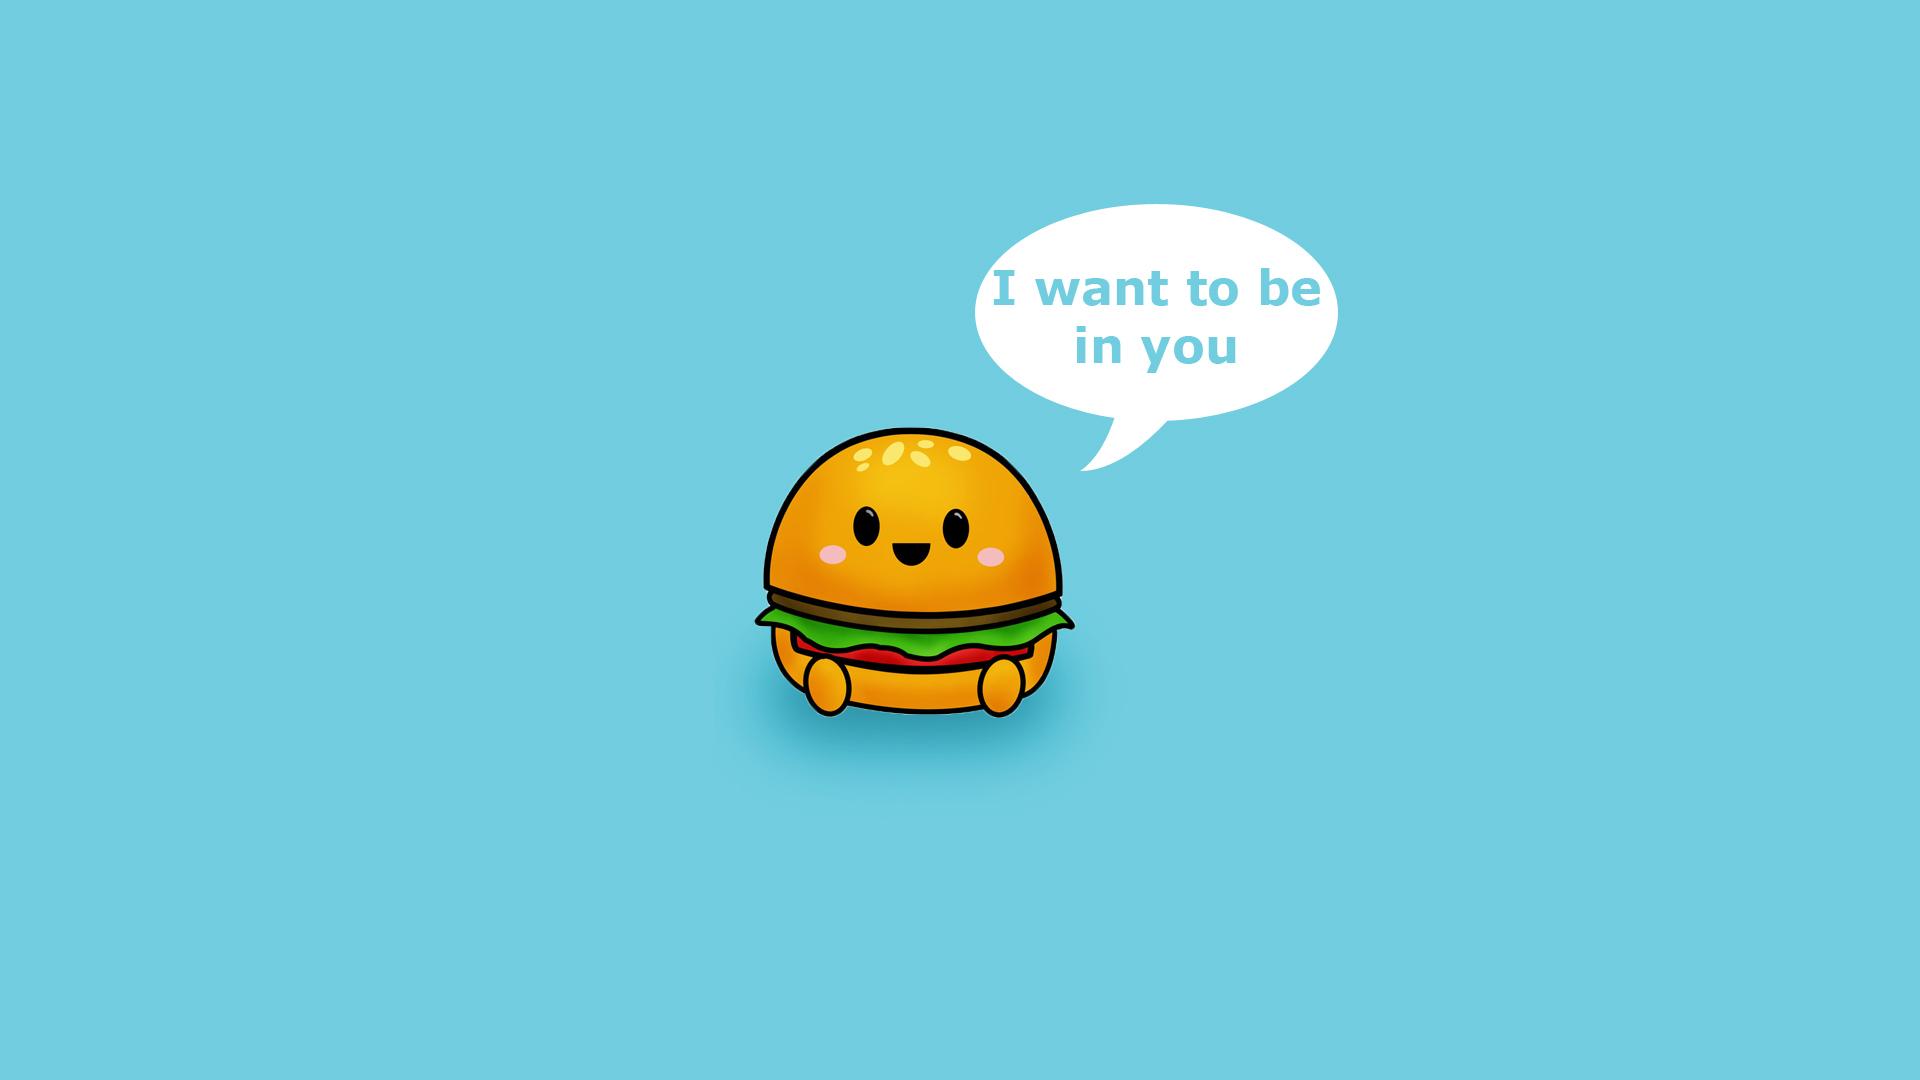 Teh Burger by MrLoLLiPoP93 on DeviantArt